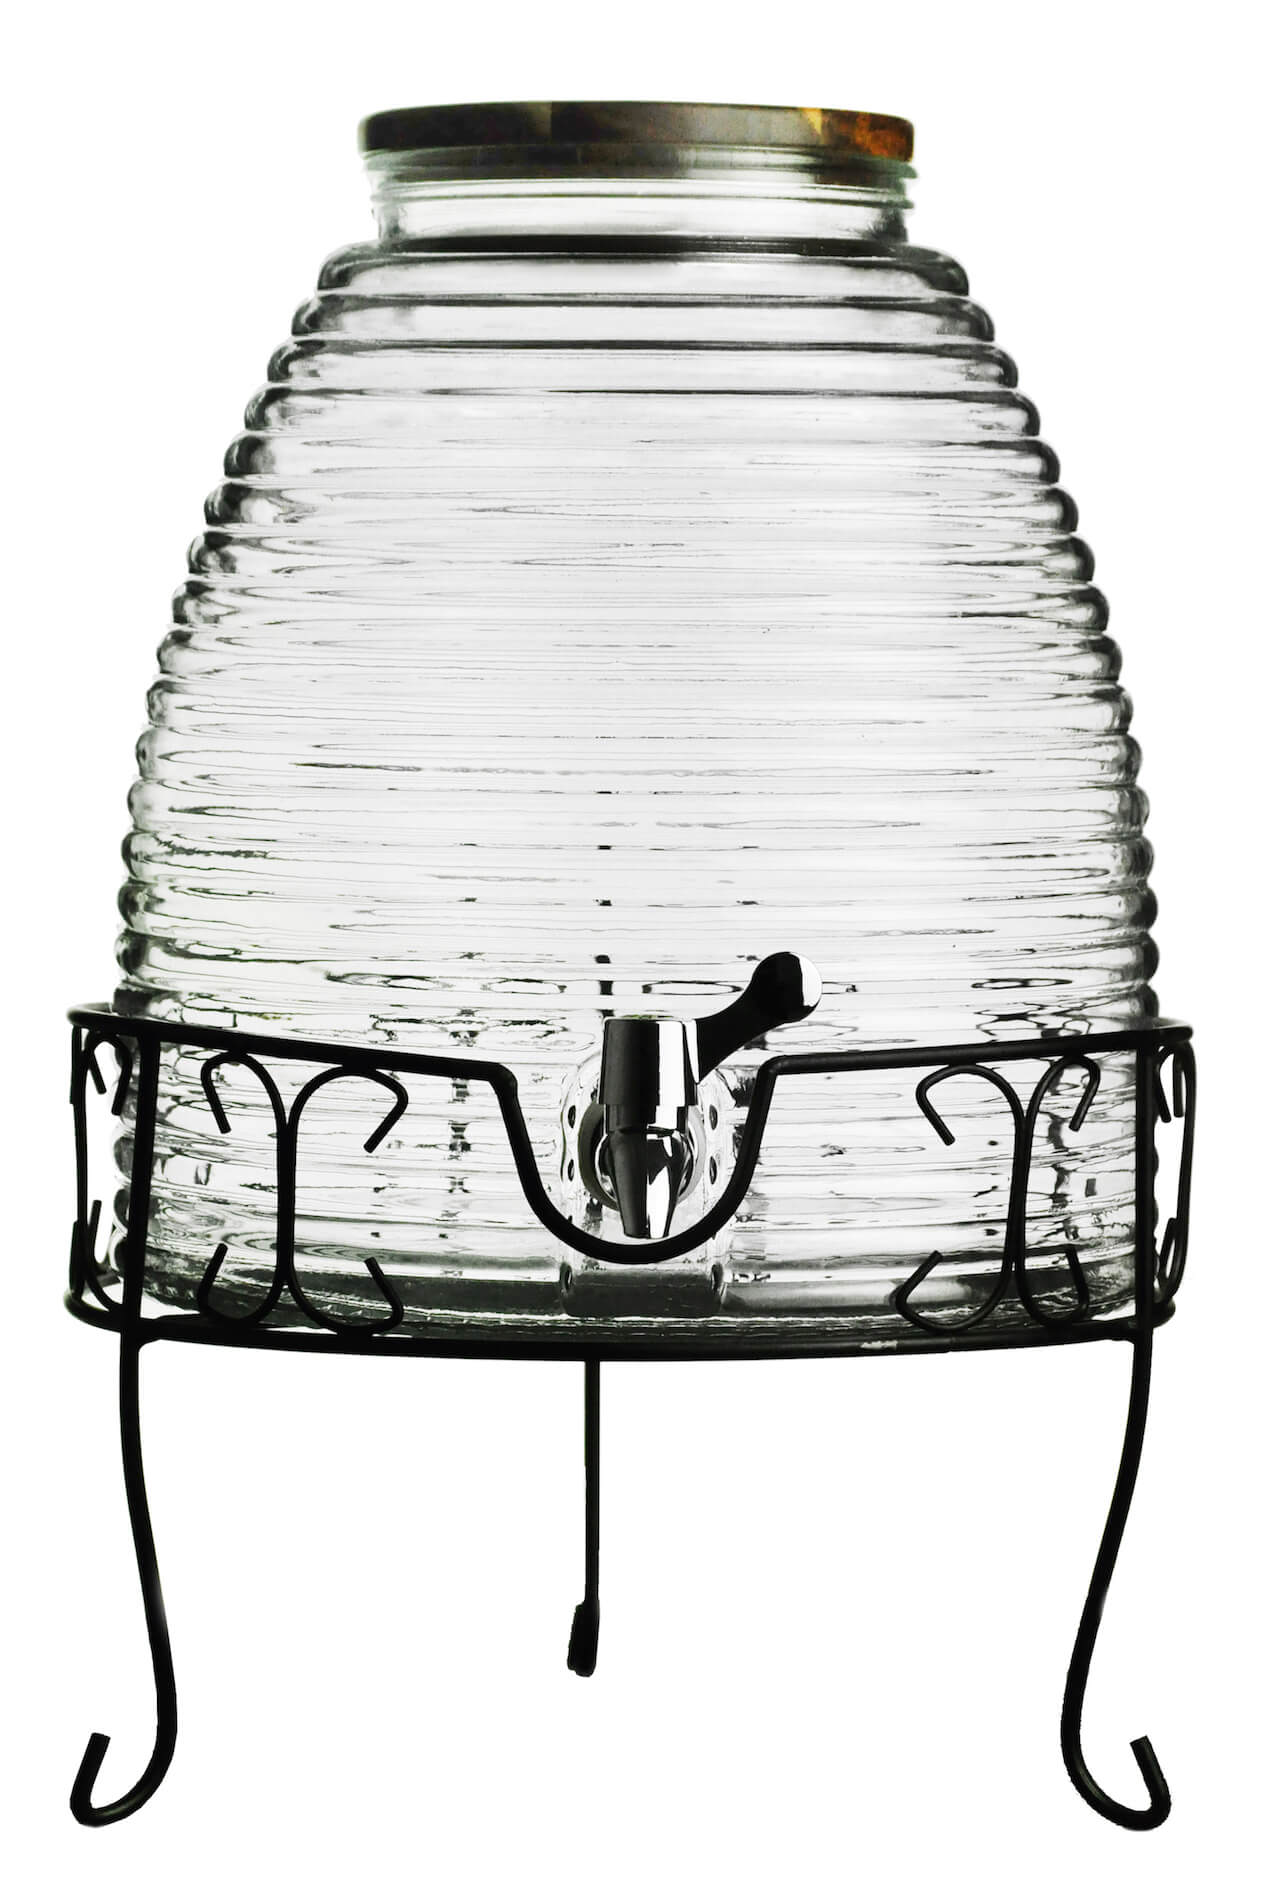 xxl getr nkespender 9 liter zapfhahn st nder wasserspender saftspender dispenser ebay. Black Bedroom Furniture Sets. Home Design Ideas